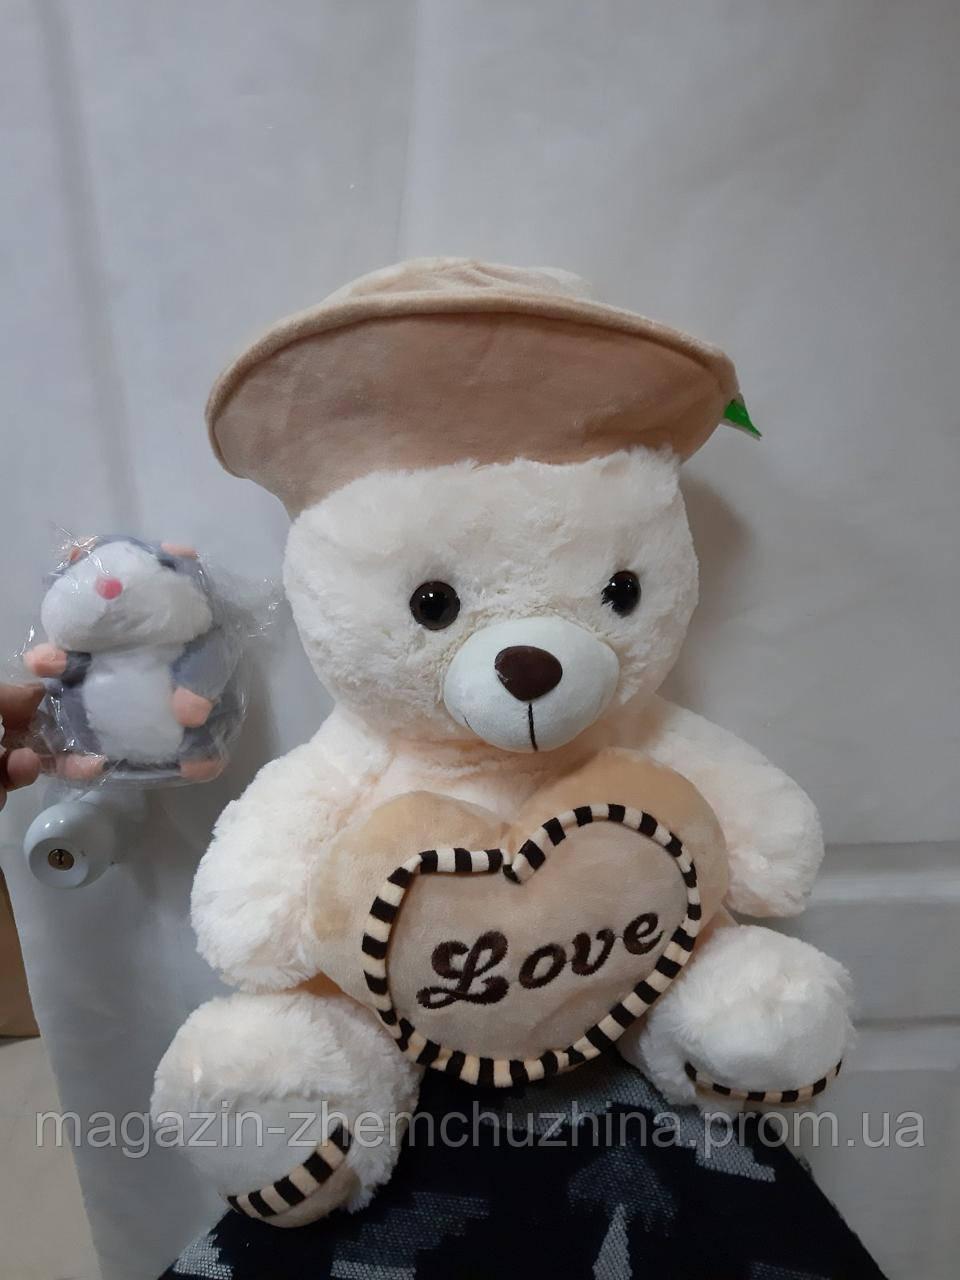 SALE! Мягкая игрушка. Медведь в шляпе с сердцем (говорит I love you)